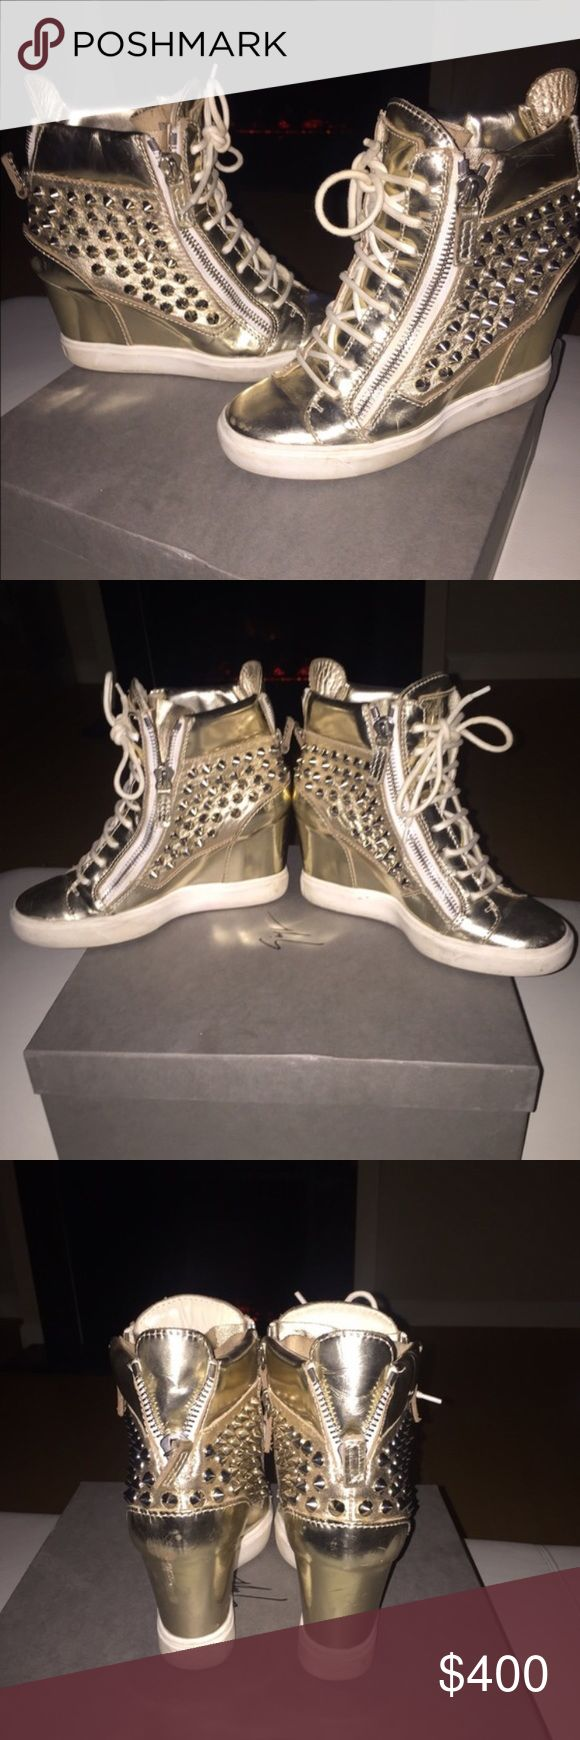 Authentic Giuseppe Zanotti Sneakers Good Condition. Comes with original box. Giuseppe Zanotti Shoes Sneakers